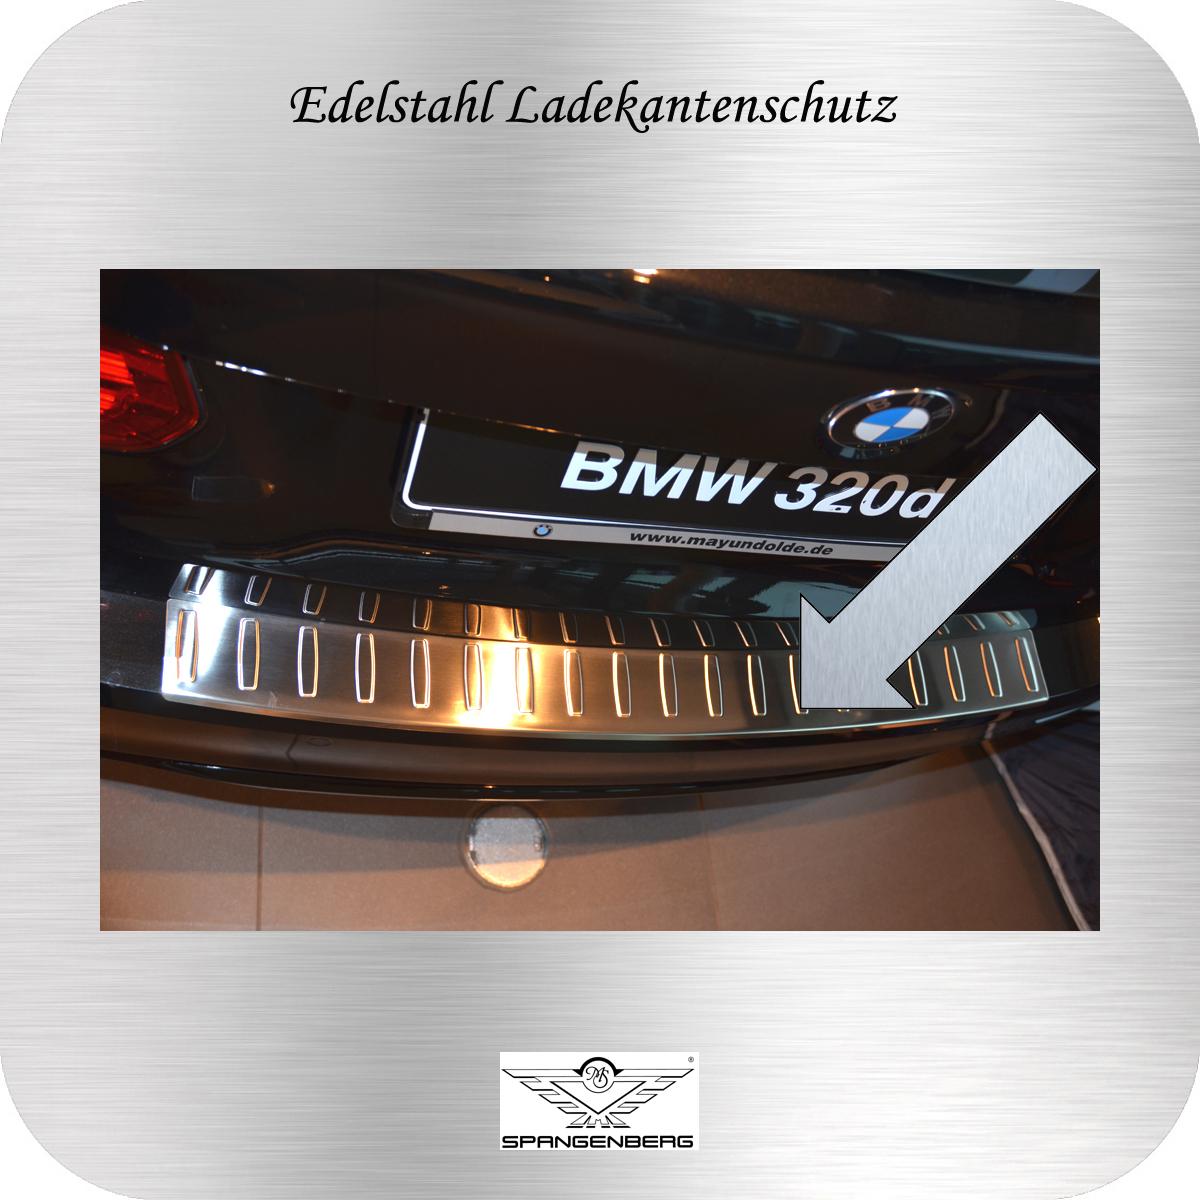 Ladekantenschutz Edelstahl BMW 3er Touring F31 Kombi 2012- 3235746